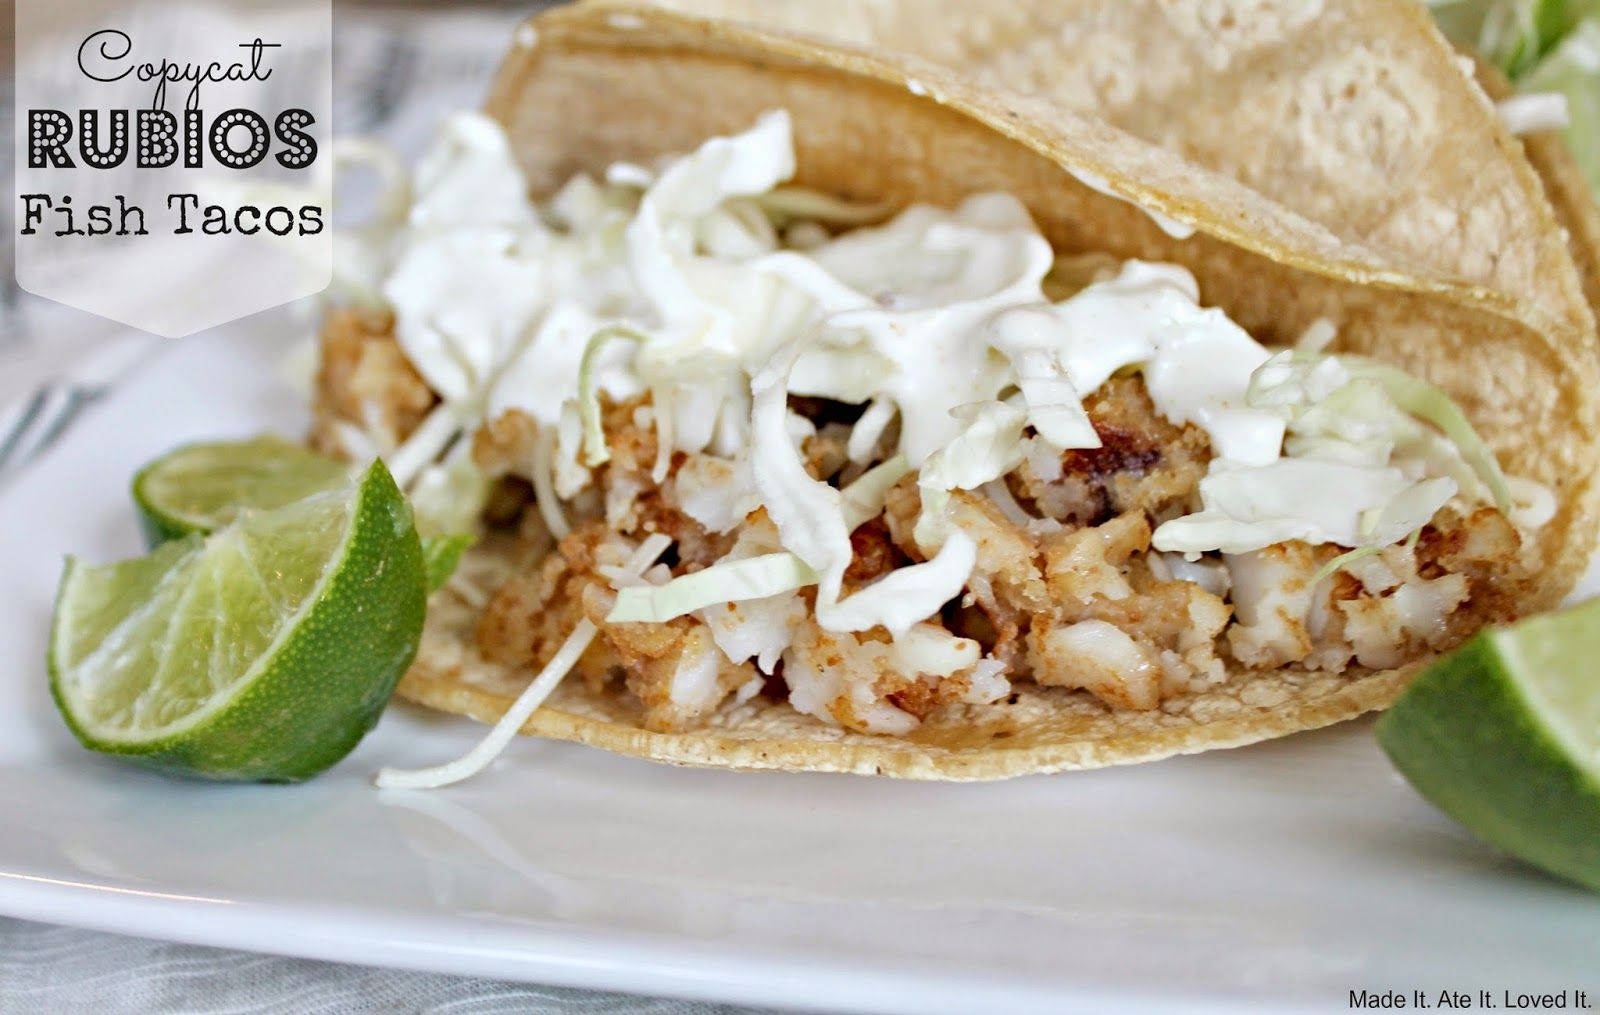 The Best Copycat Rubio S Fish Taco Recipe Rubios Fish Tacos